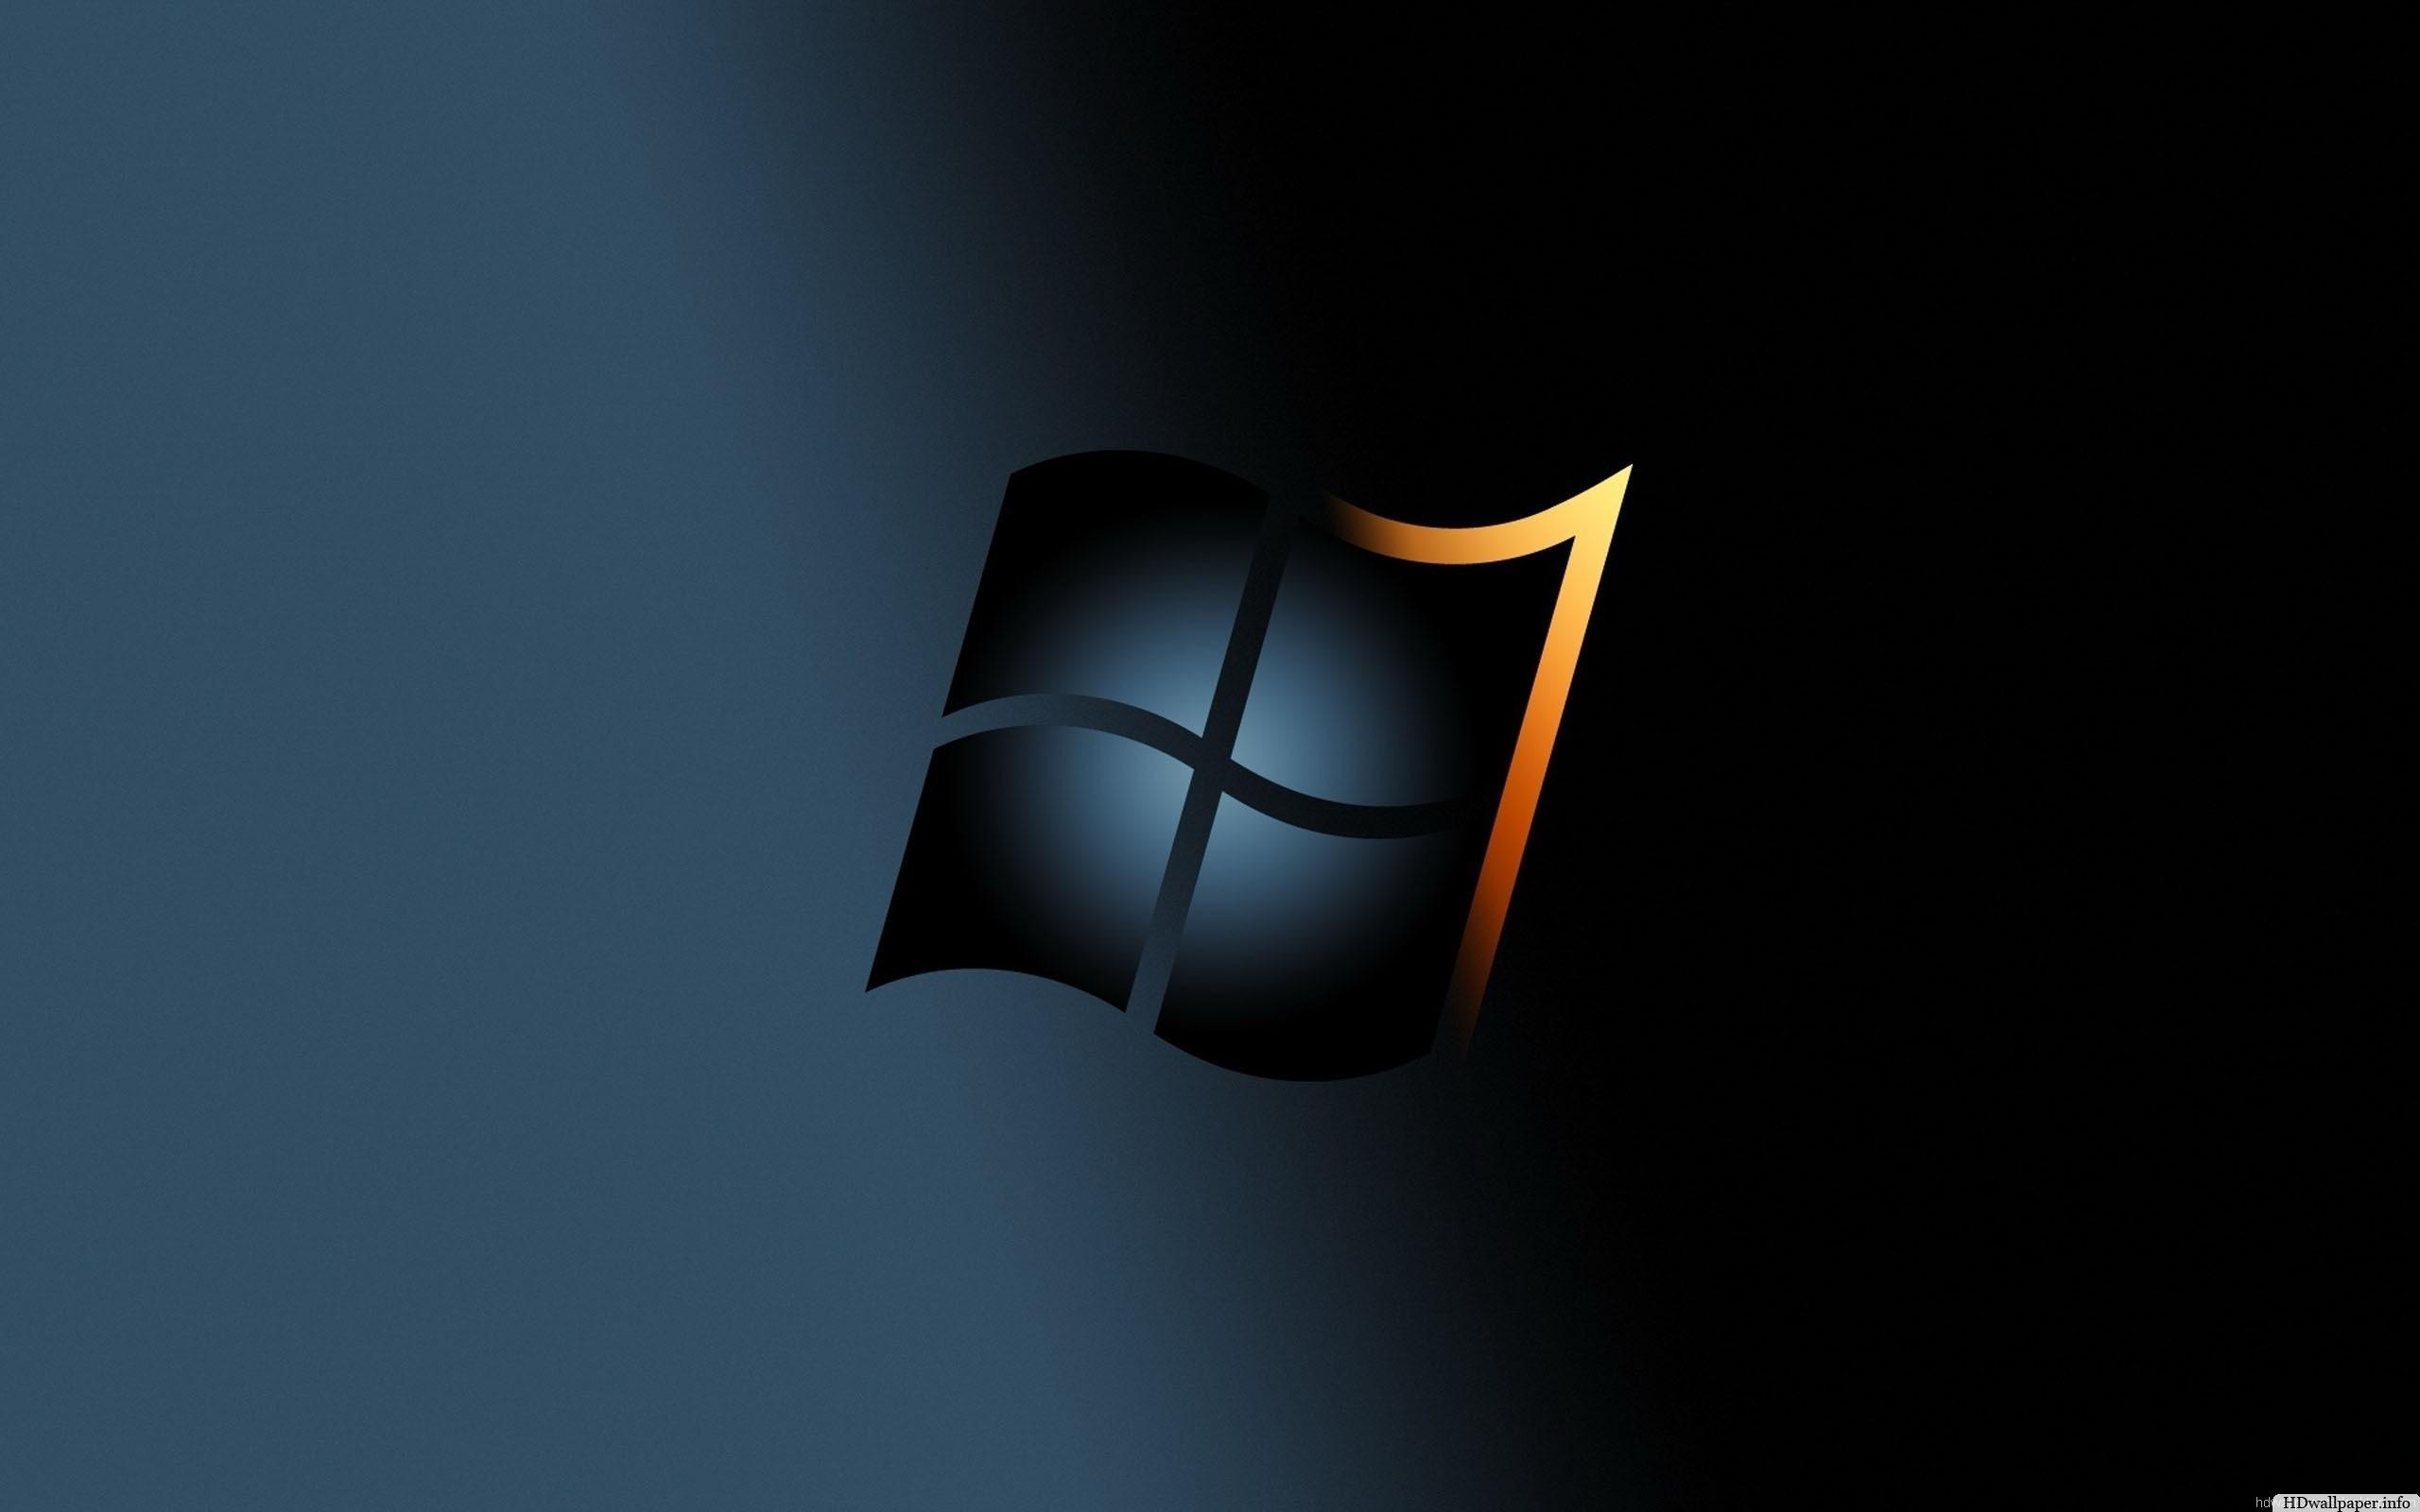 wallpaper hd for desktop full screen windows 7 – https://hdwallpaper.info